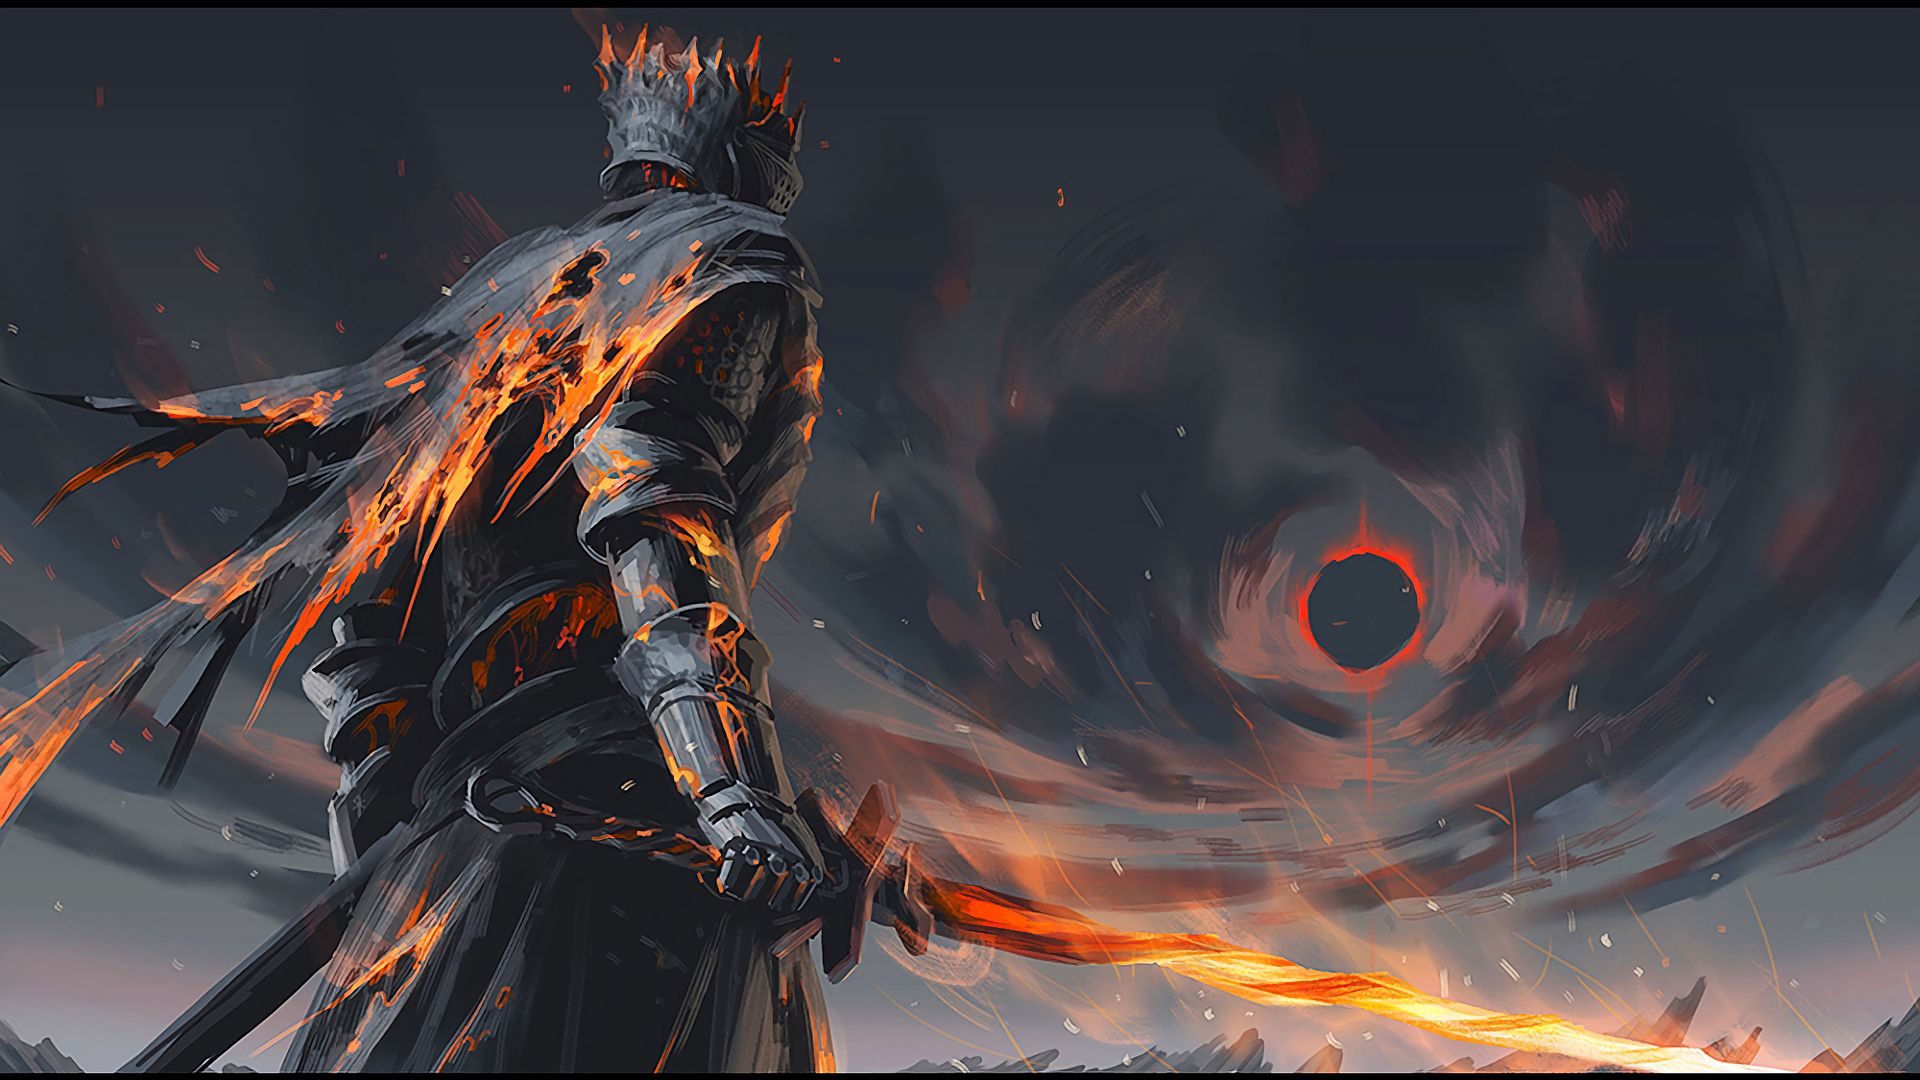 Dark Souls And Bloodborne Wallpaper Dump Spoilers Ahead Album On Imgur Dark Souls Wallpaper Dark Souls Art Dark Souls 3 Wallpapers